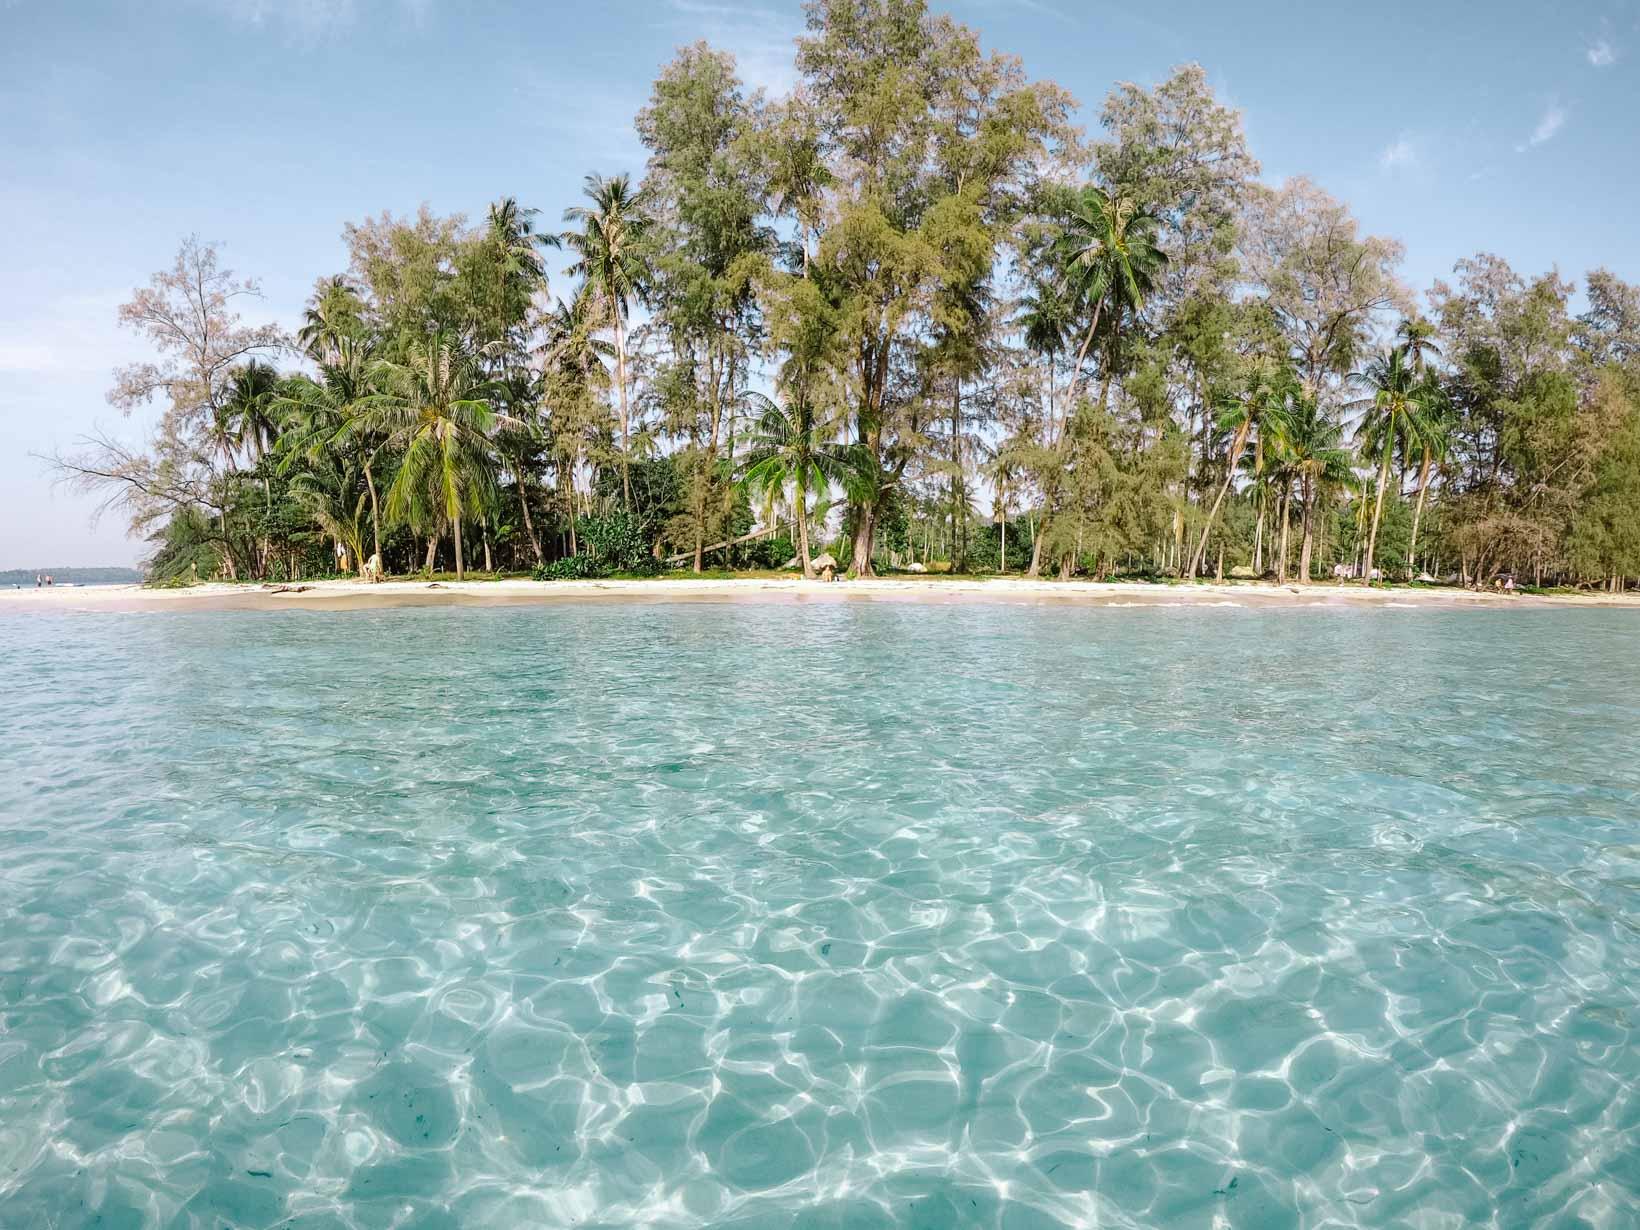 Spiaggia Klong Han a Koh Kood